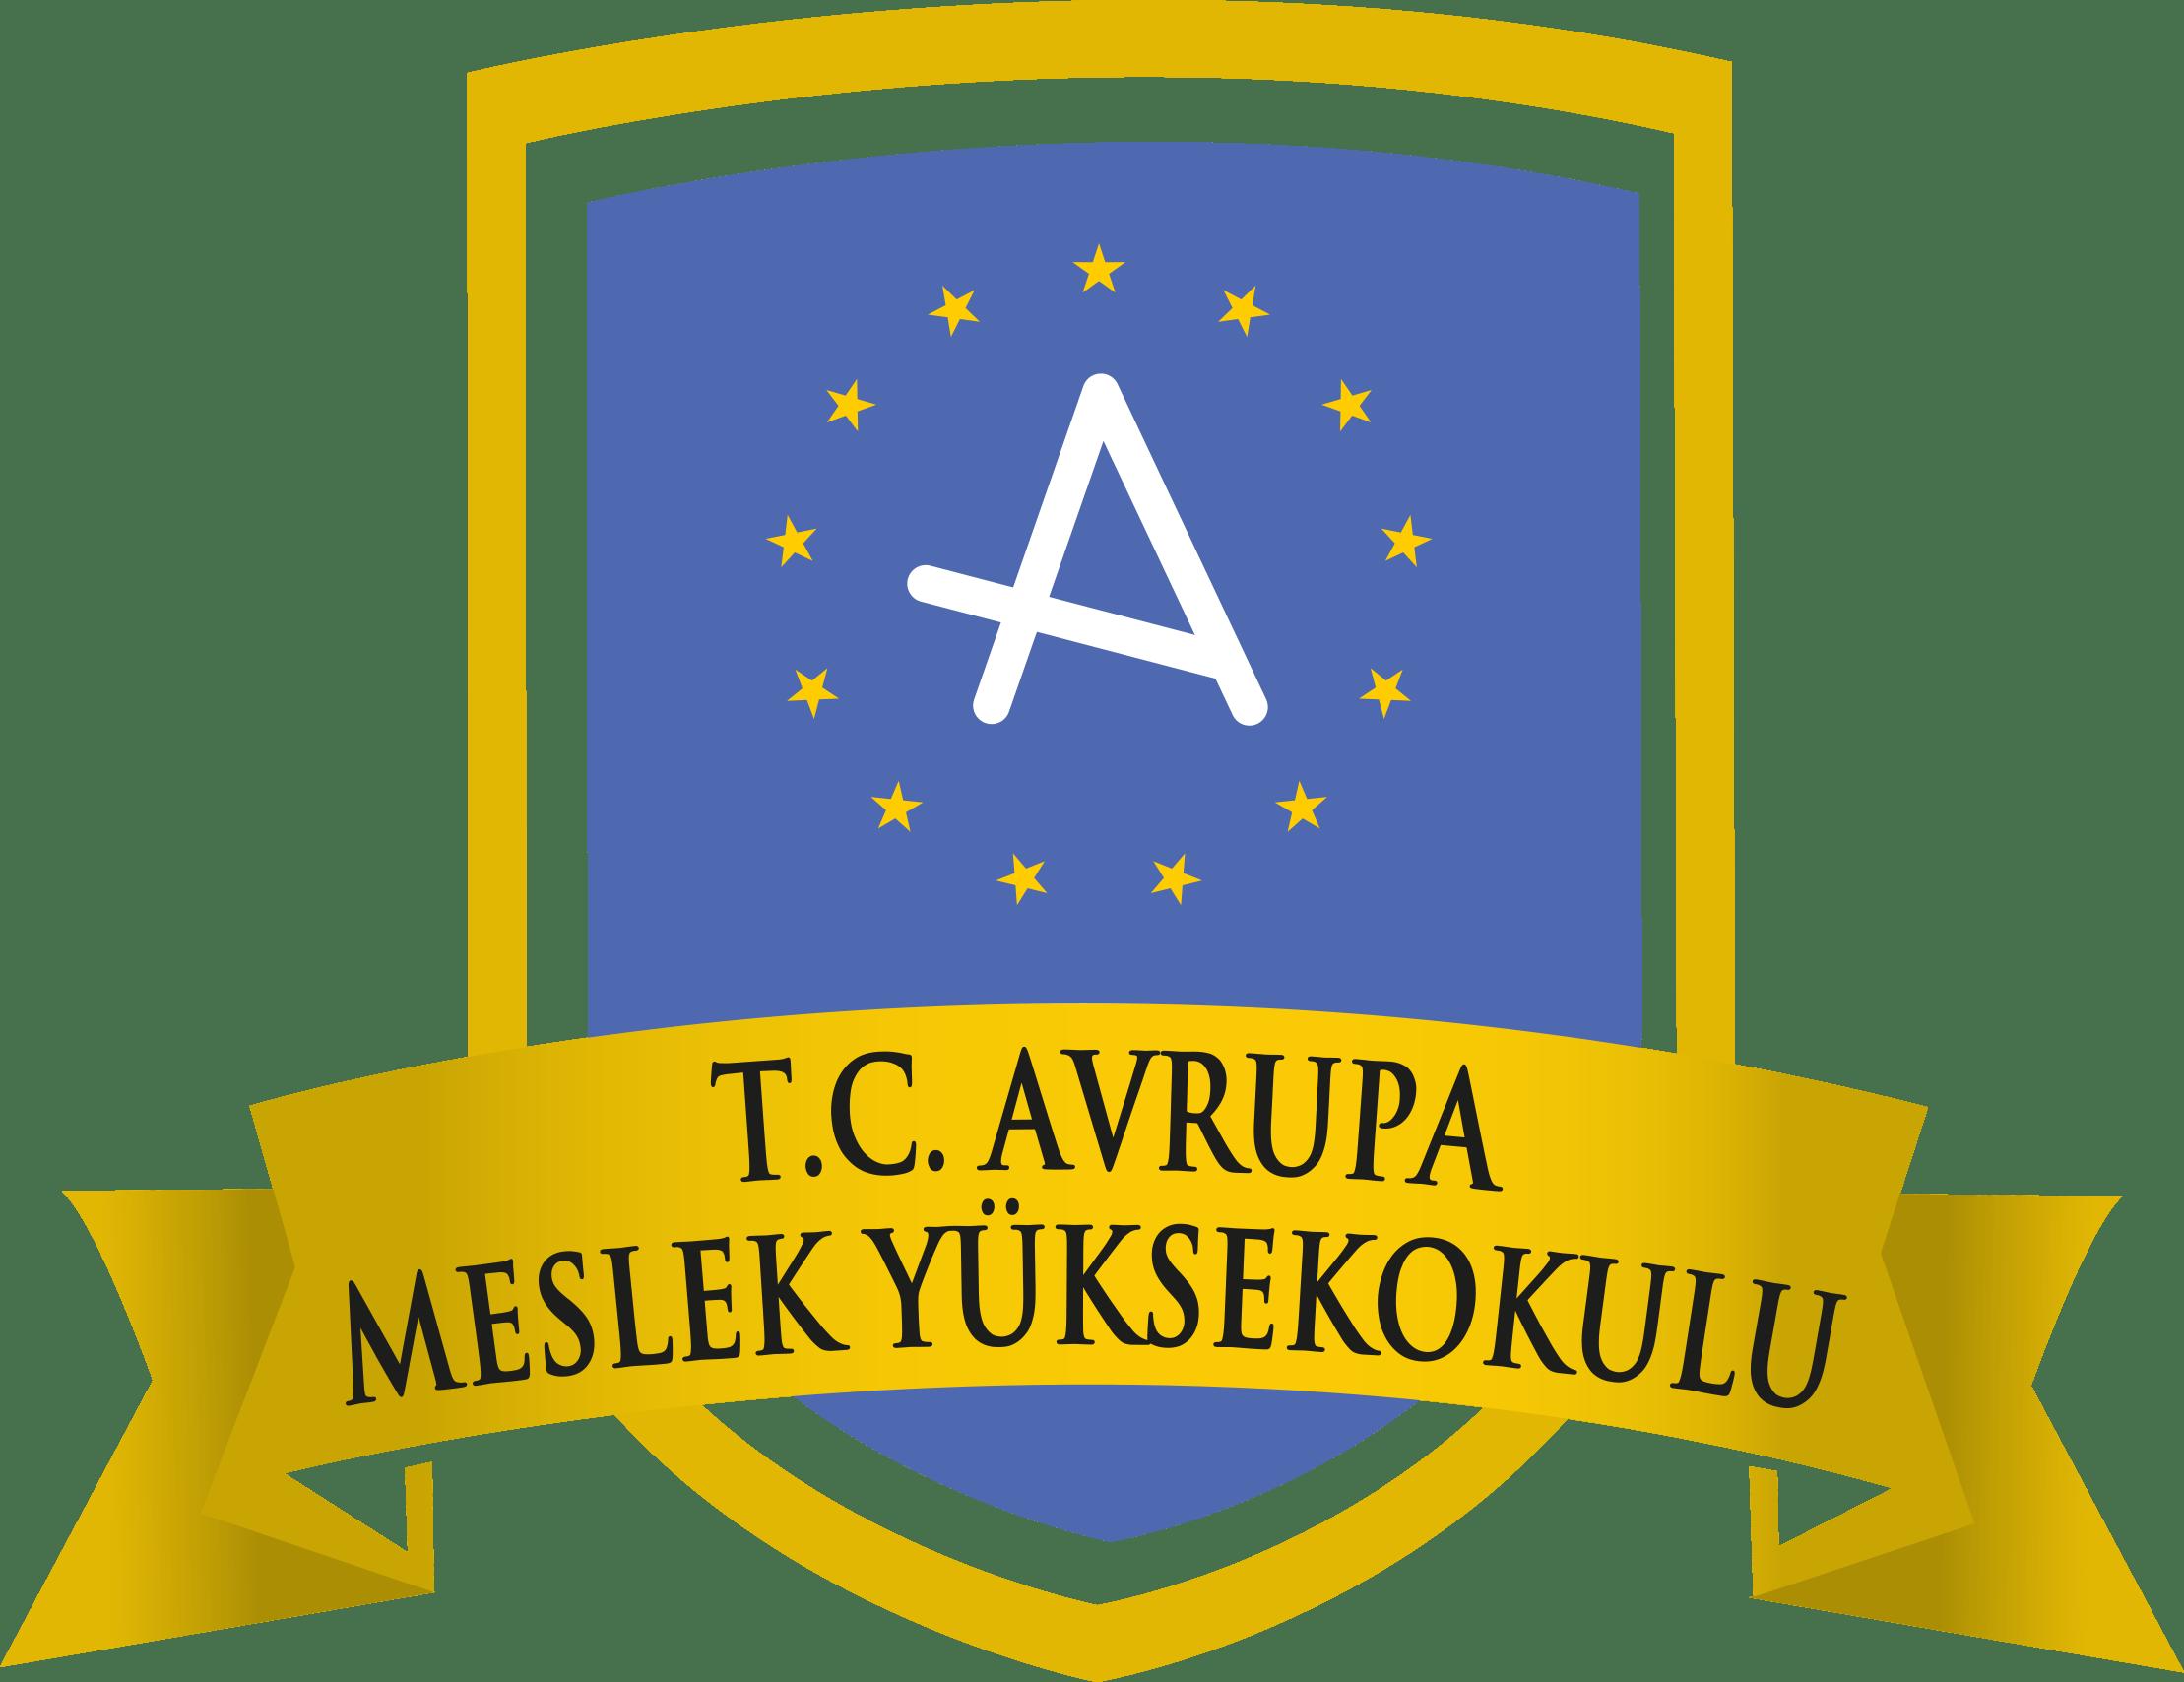 Avrupa Meslek Yüksekokulu Logo   Amblem png